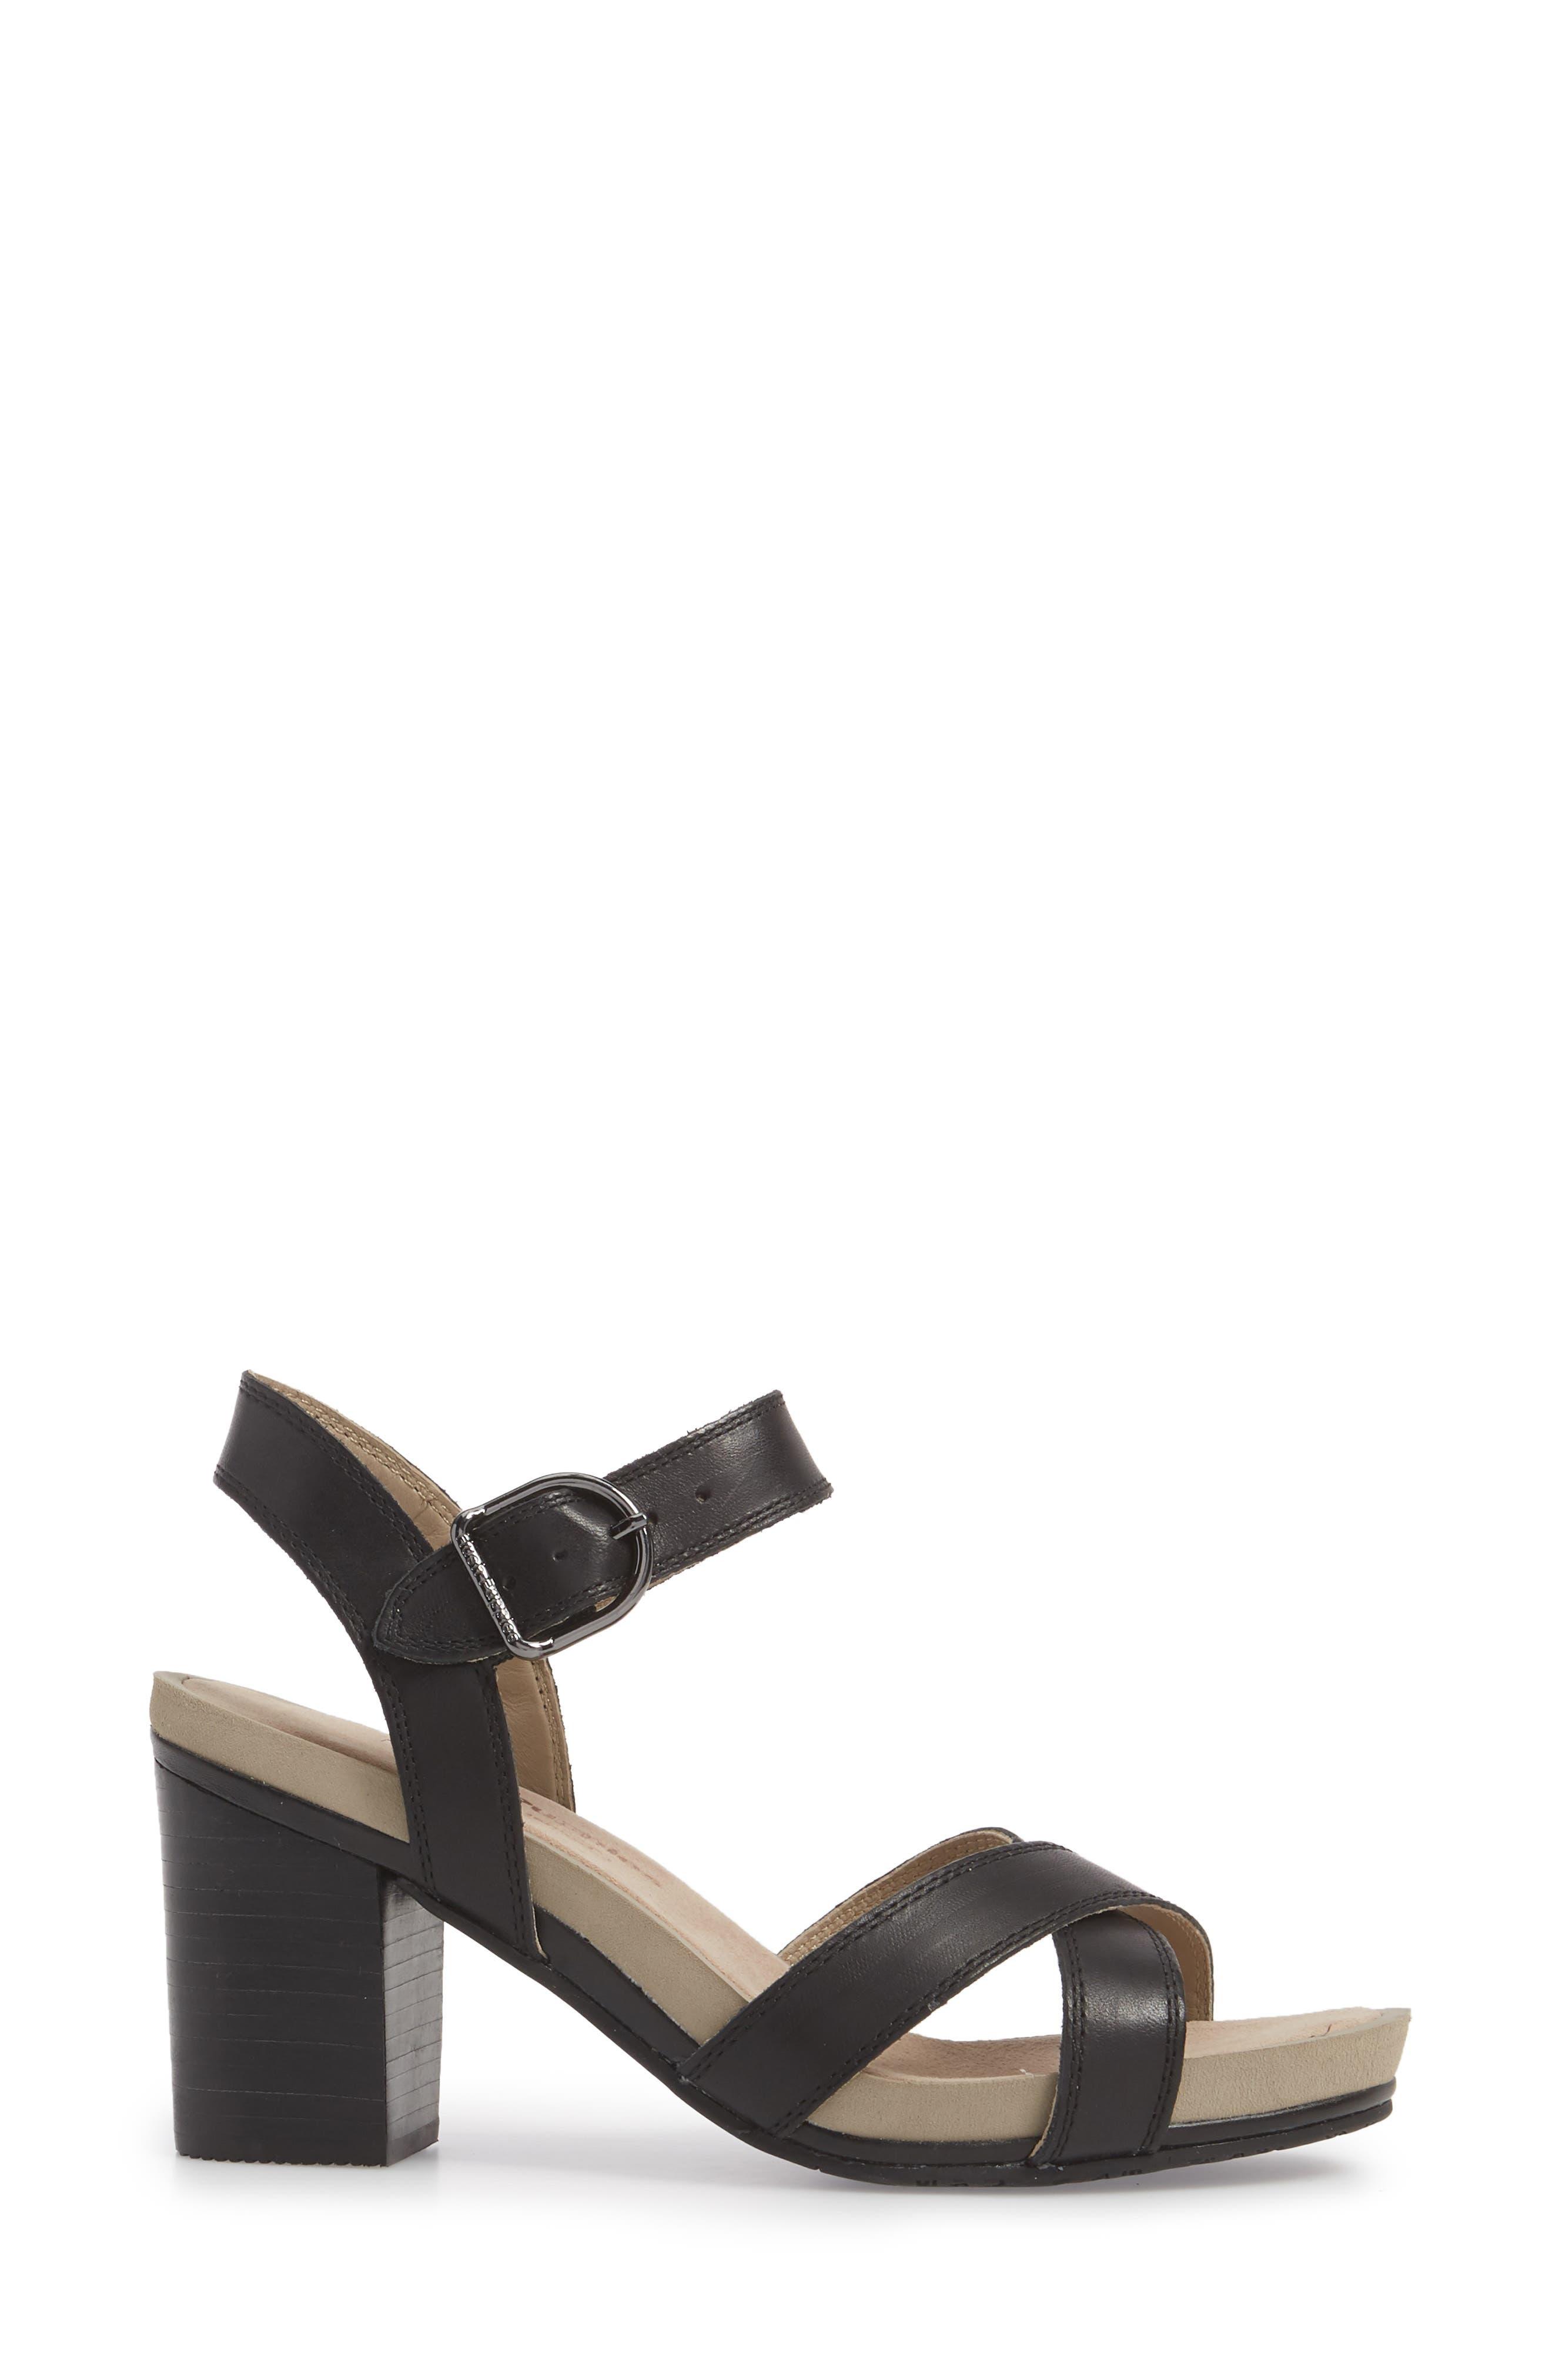 Mariska Block Heel Sandal,                             Alternate thumbnail 3, color,                             Black Leather